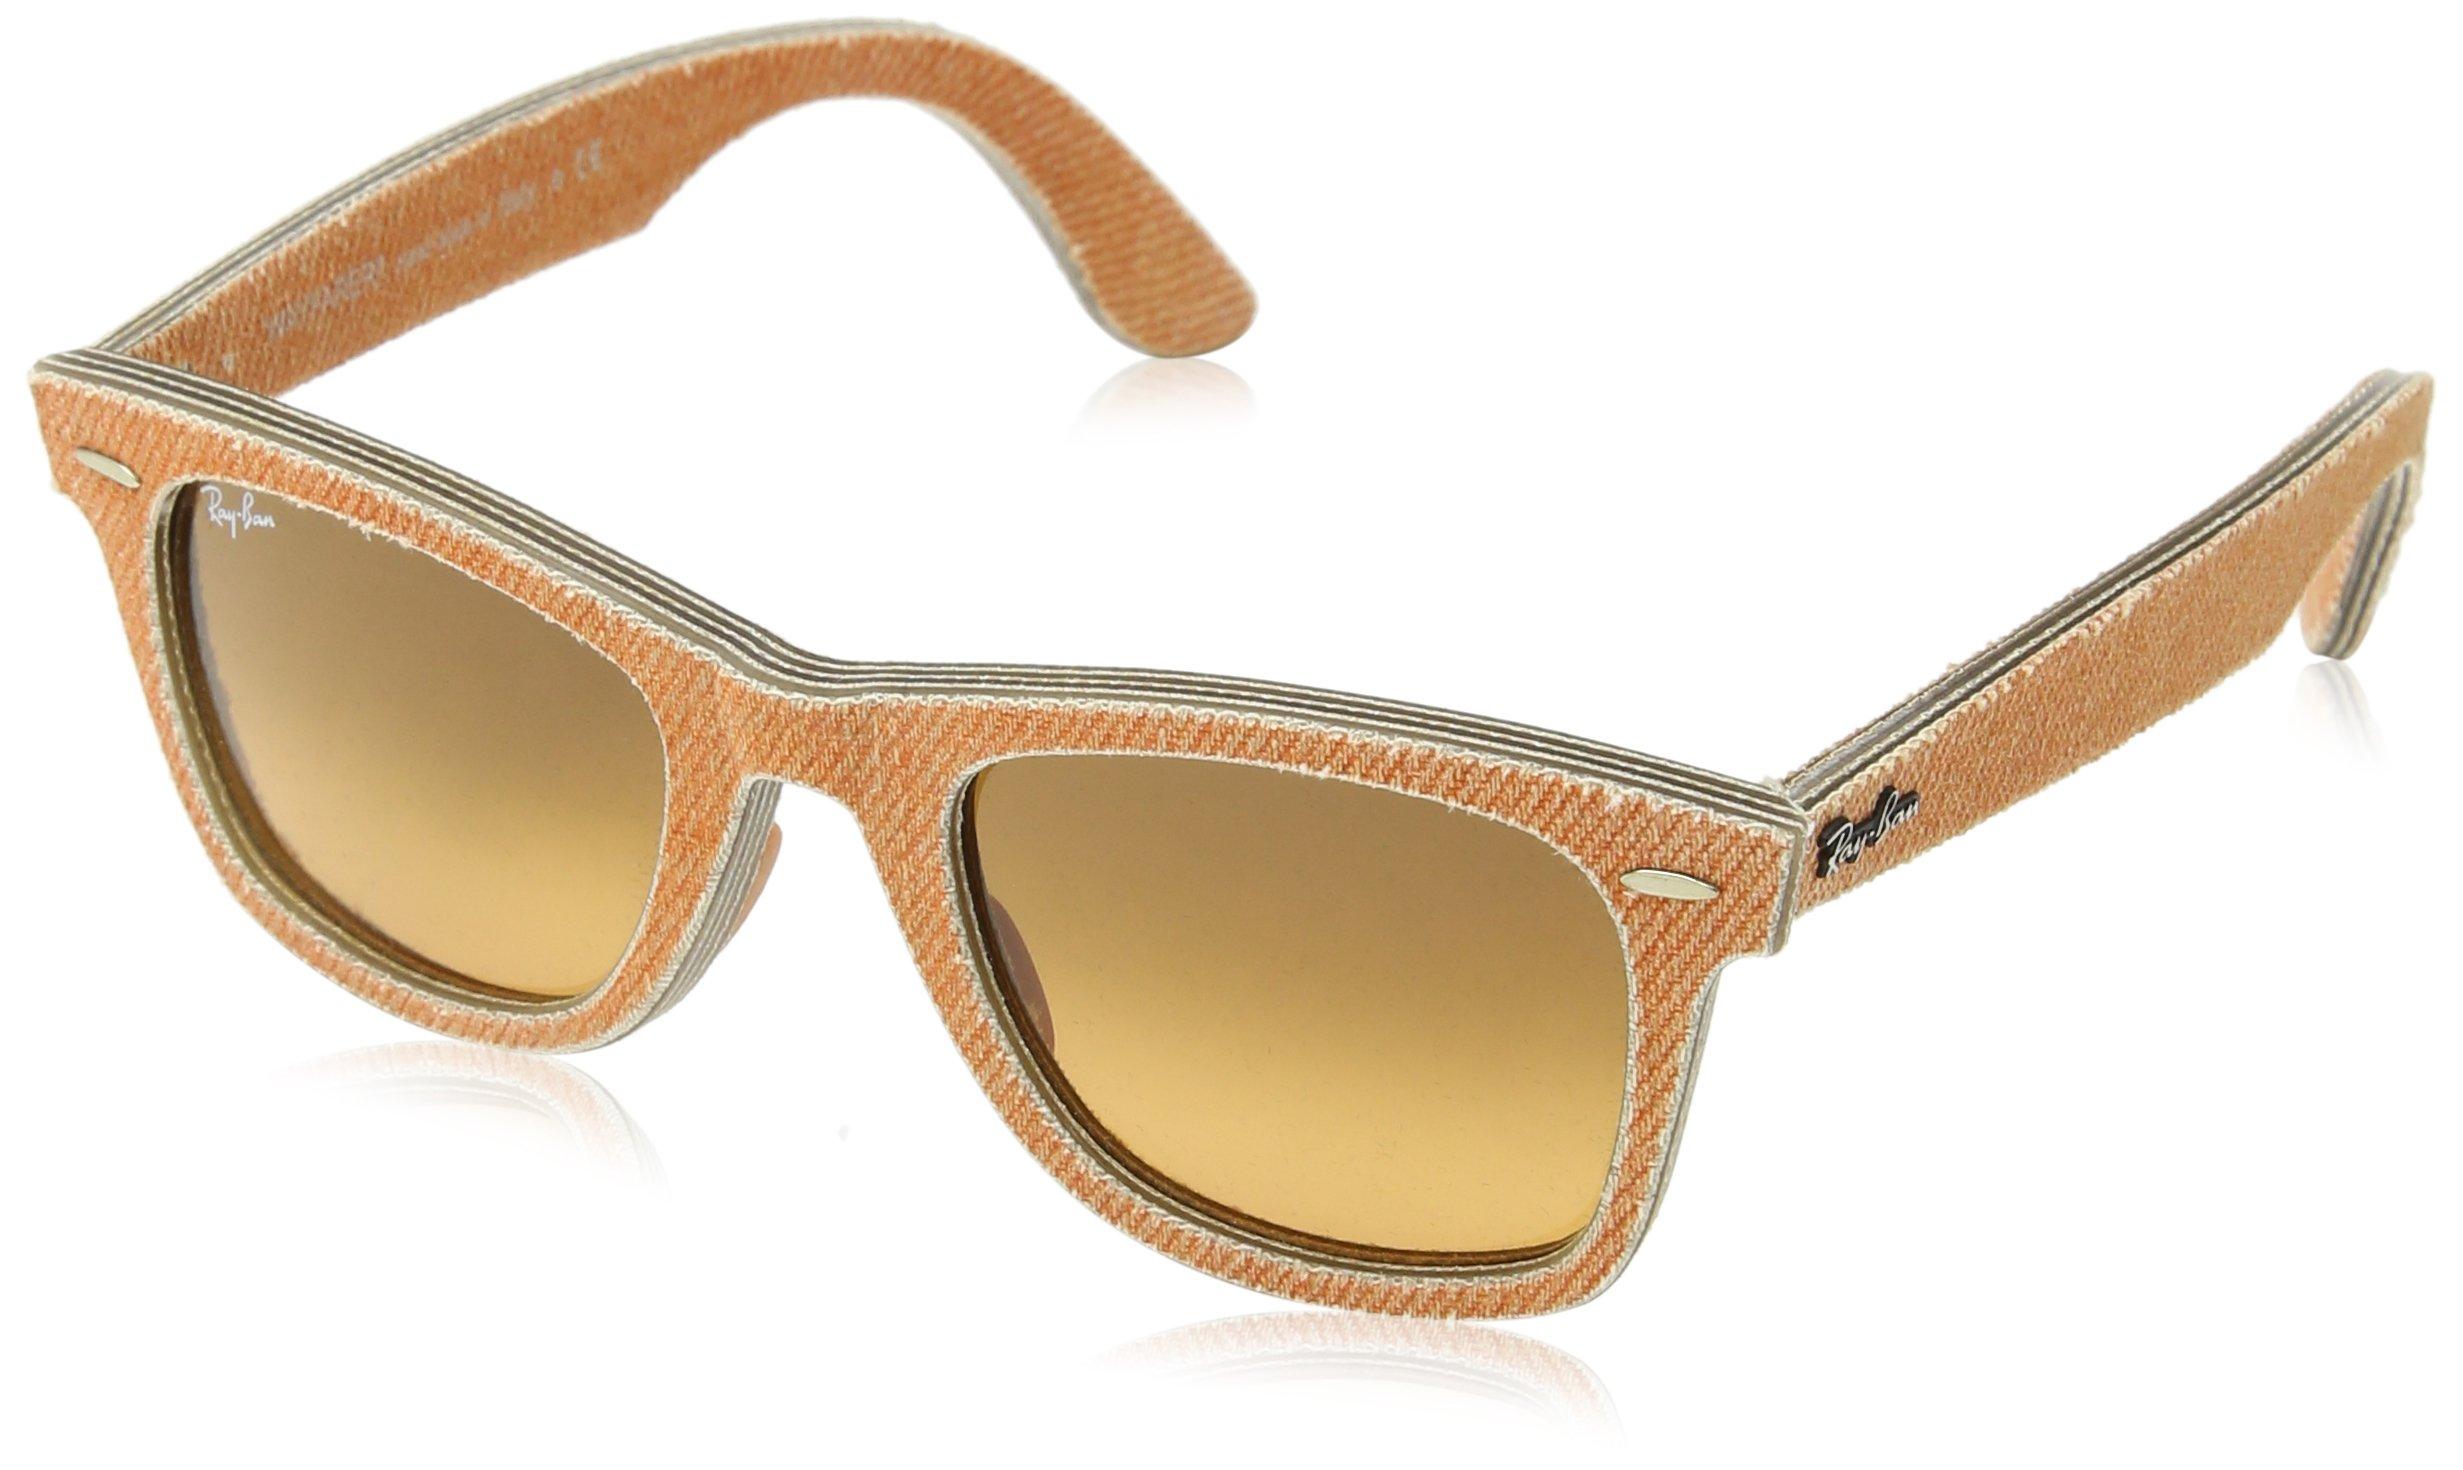 Ray-Ban Unisex ORB2140 Wayfarer Jeans Orange Sunglasses